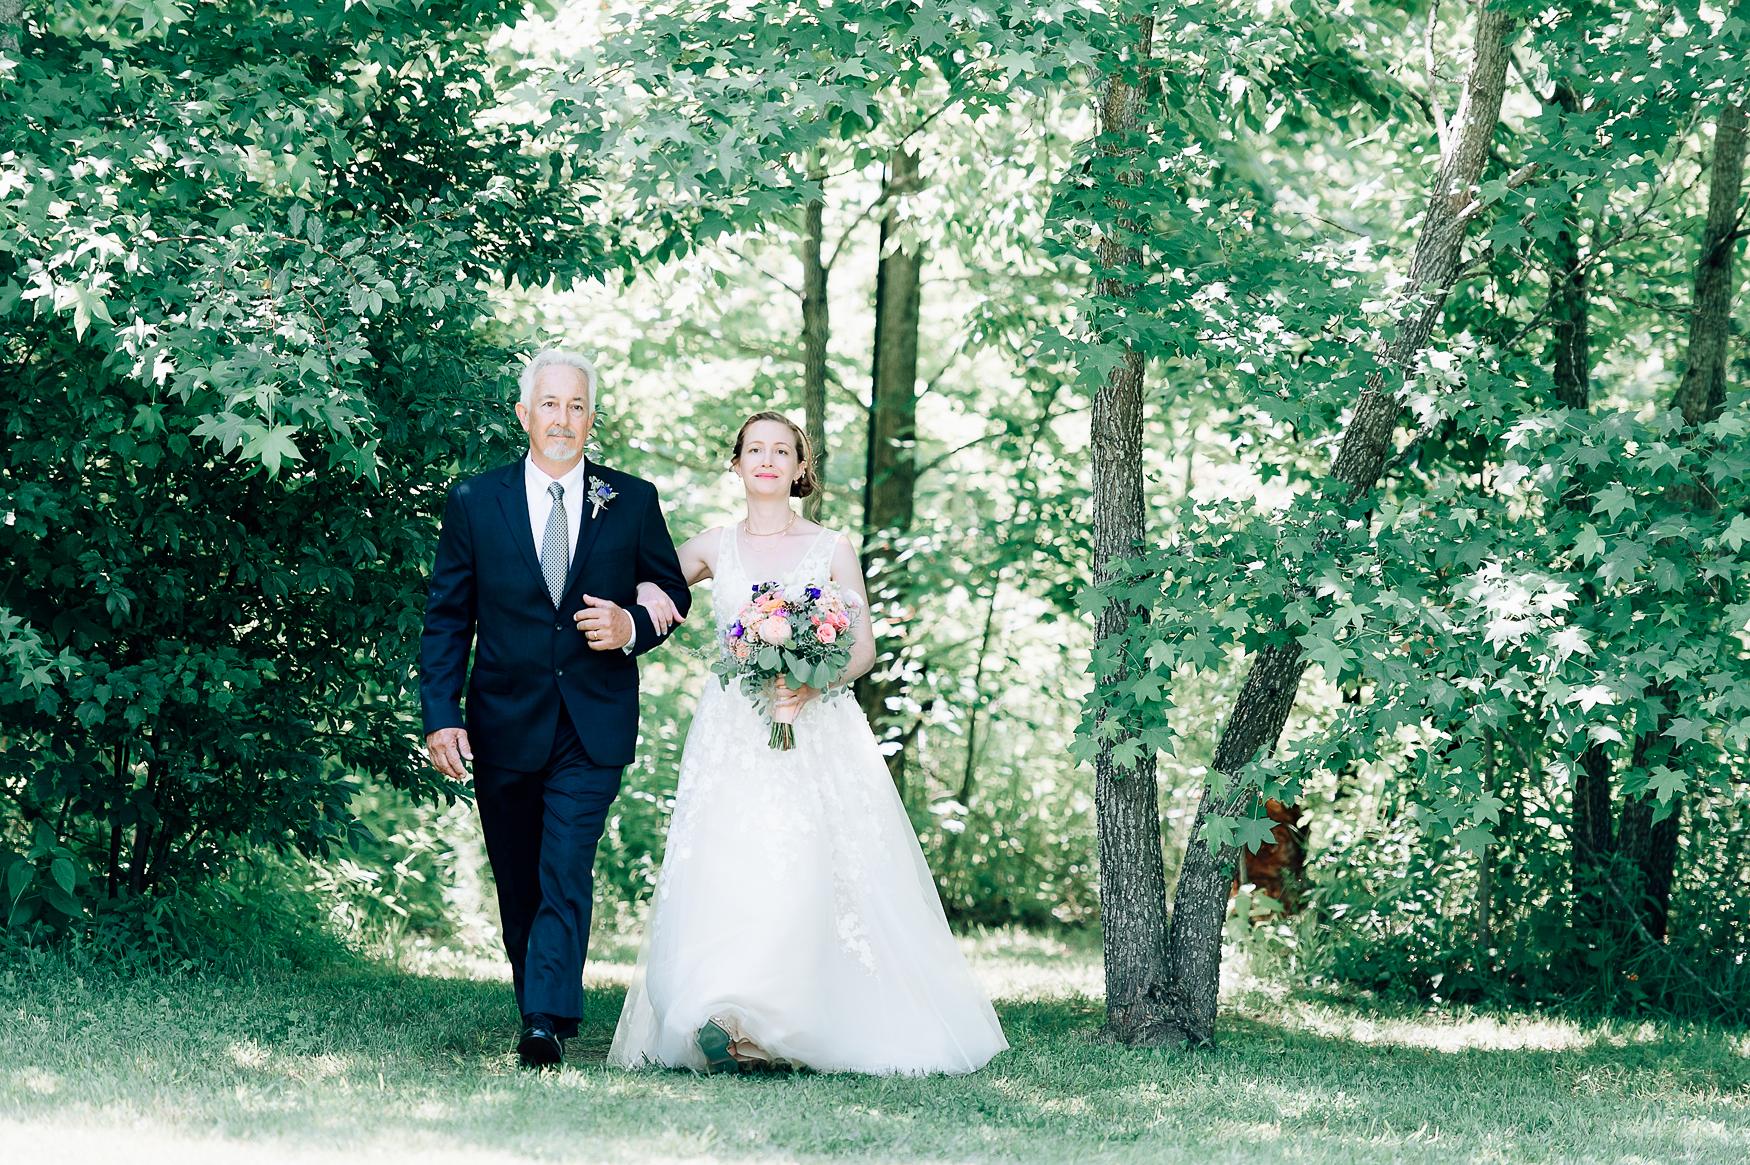 virginiawedding_theGlasgowFarm_rusticwedding_fredericksburg_youseephotography_CarolineDale (35).jpg